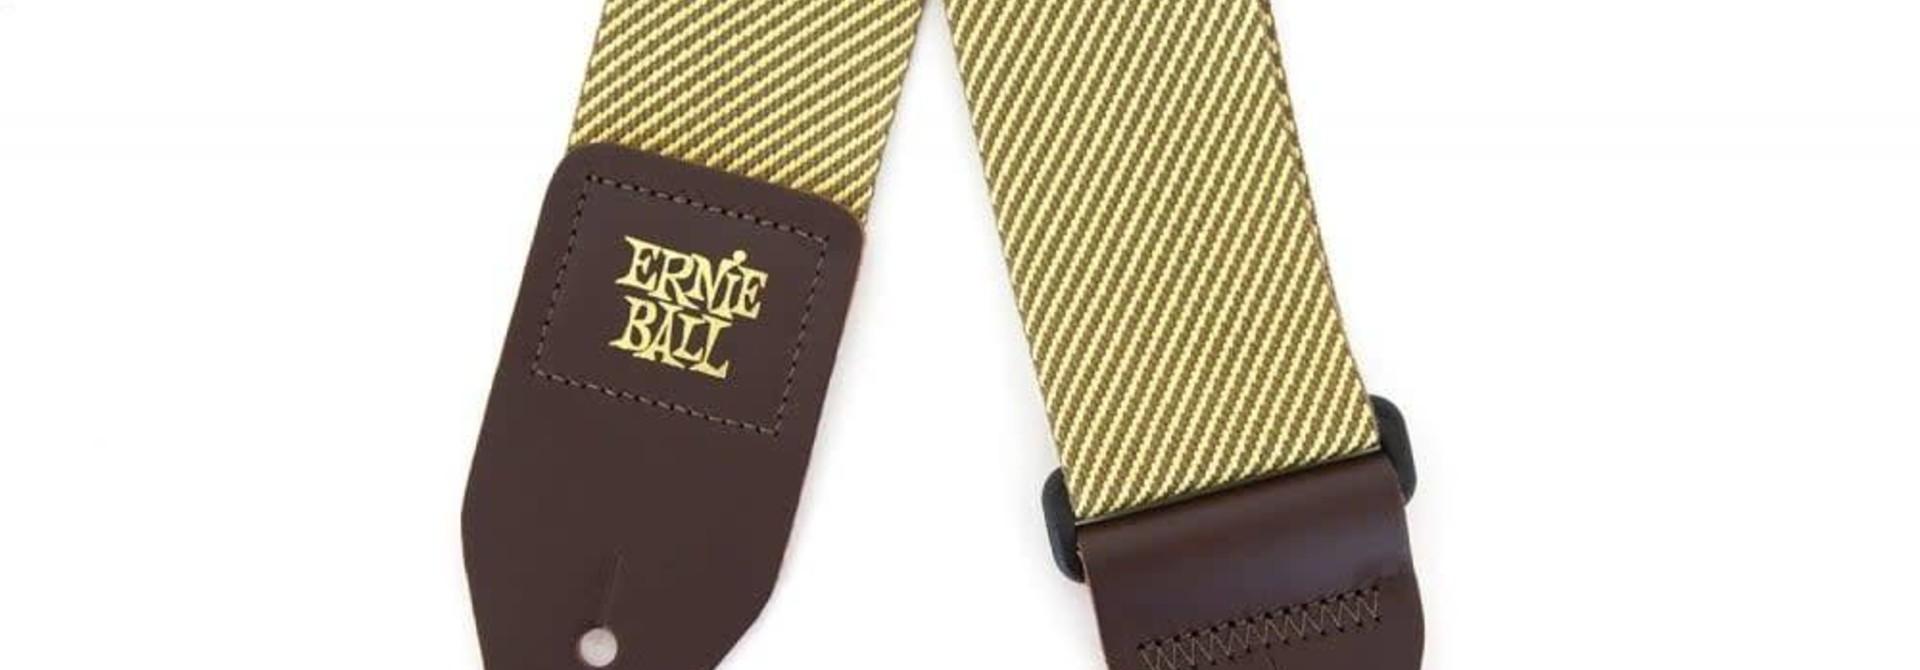 Ernie Ball Tweed Strap P04100